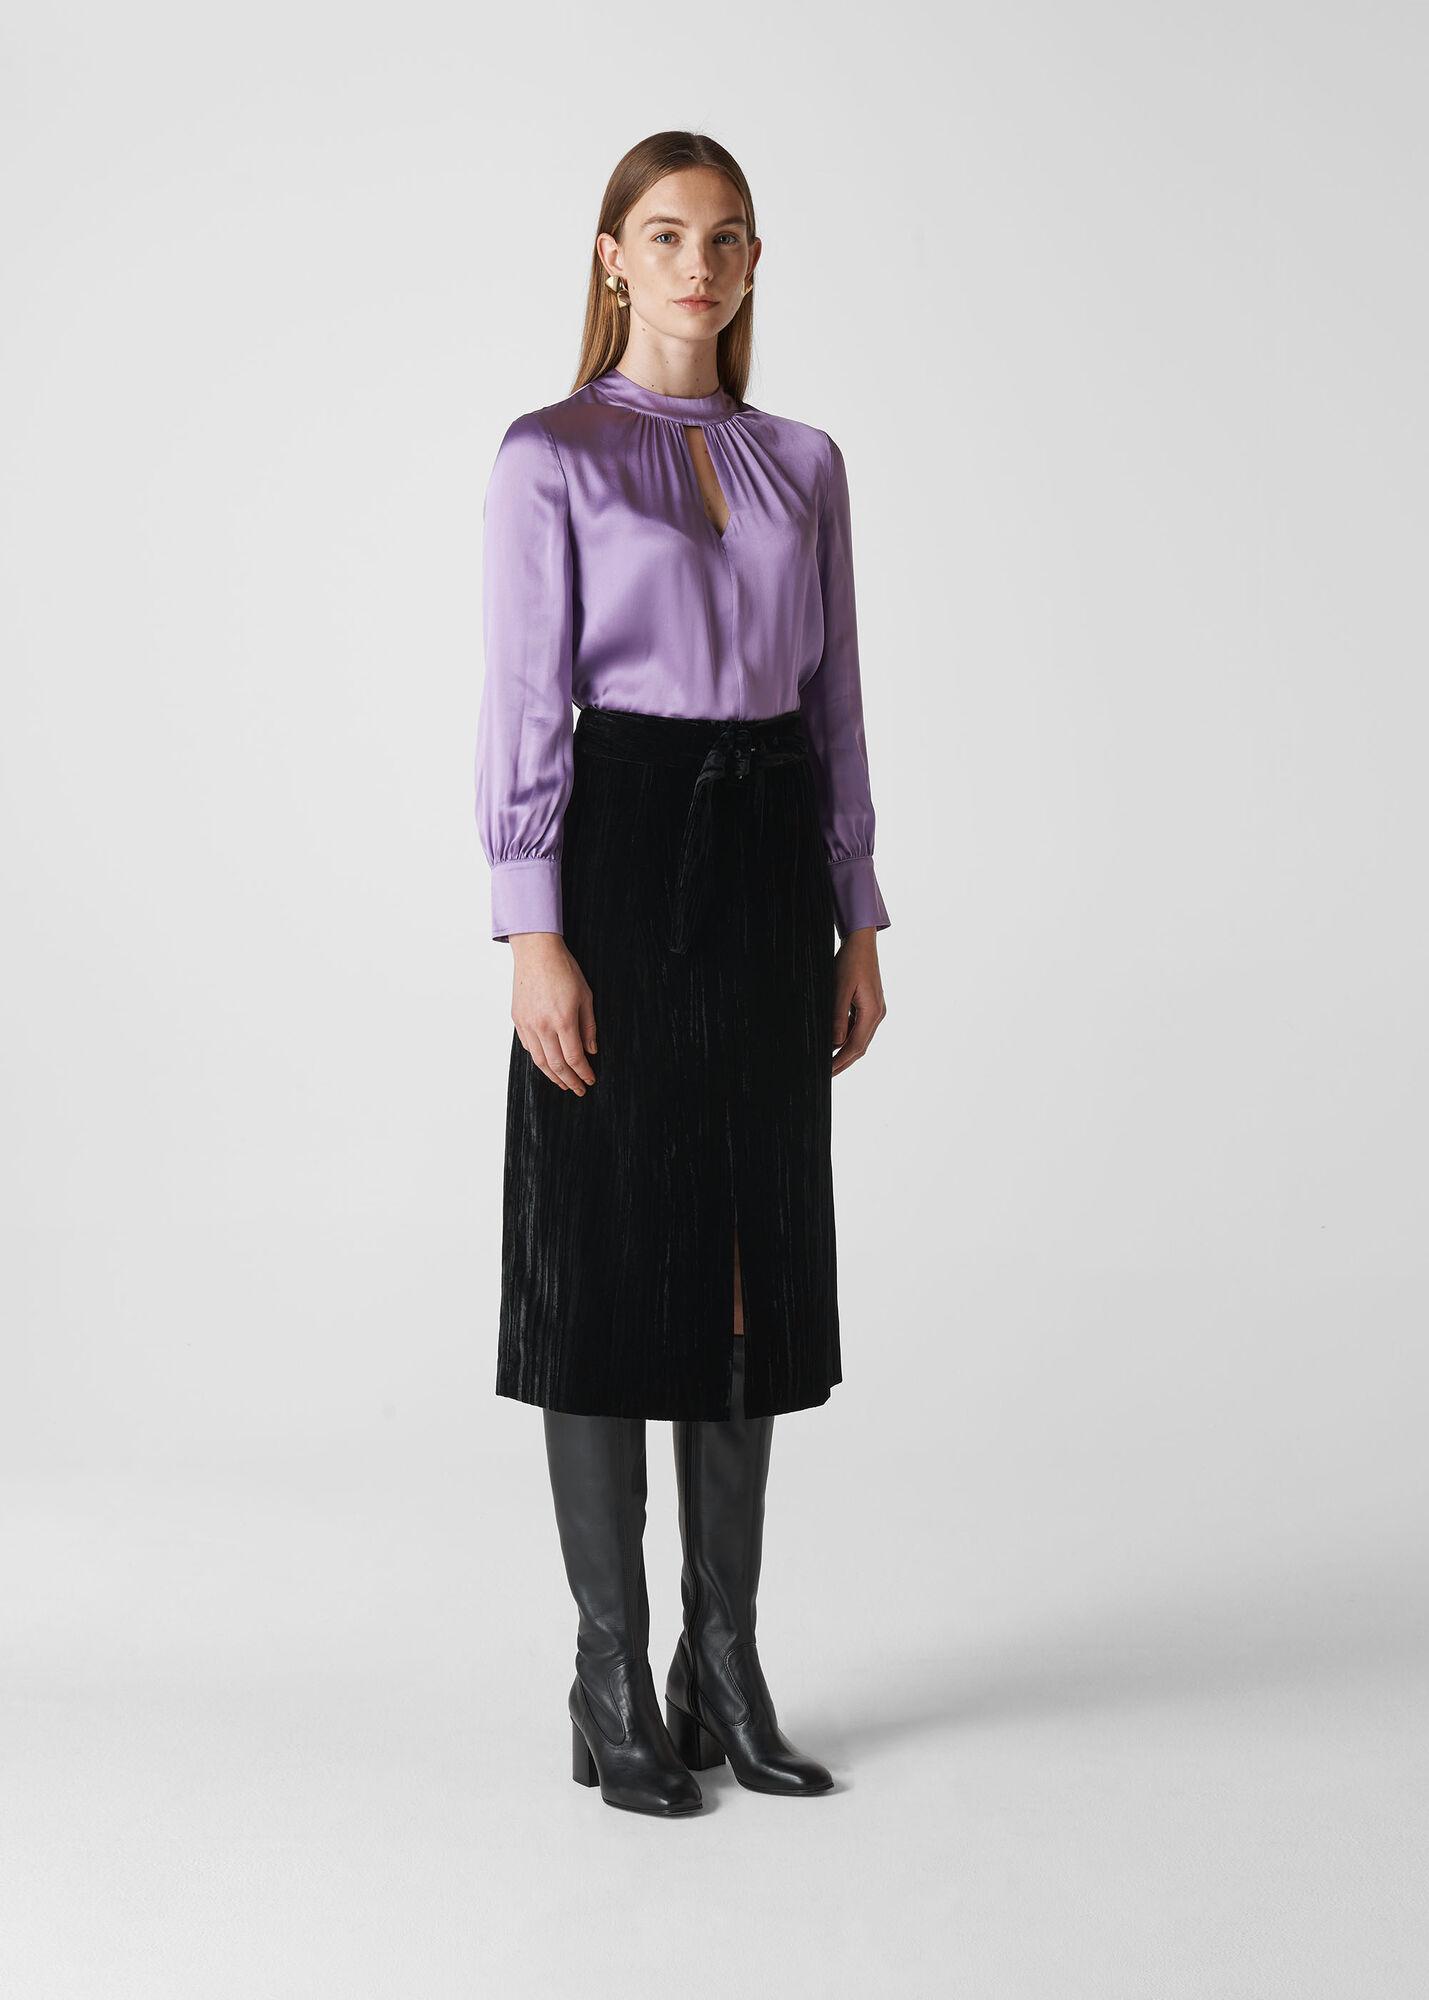 Cora Silk Satin Blouse